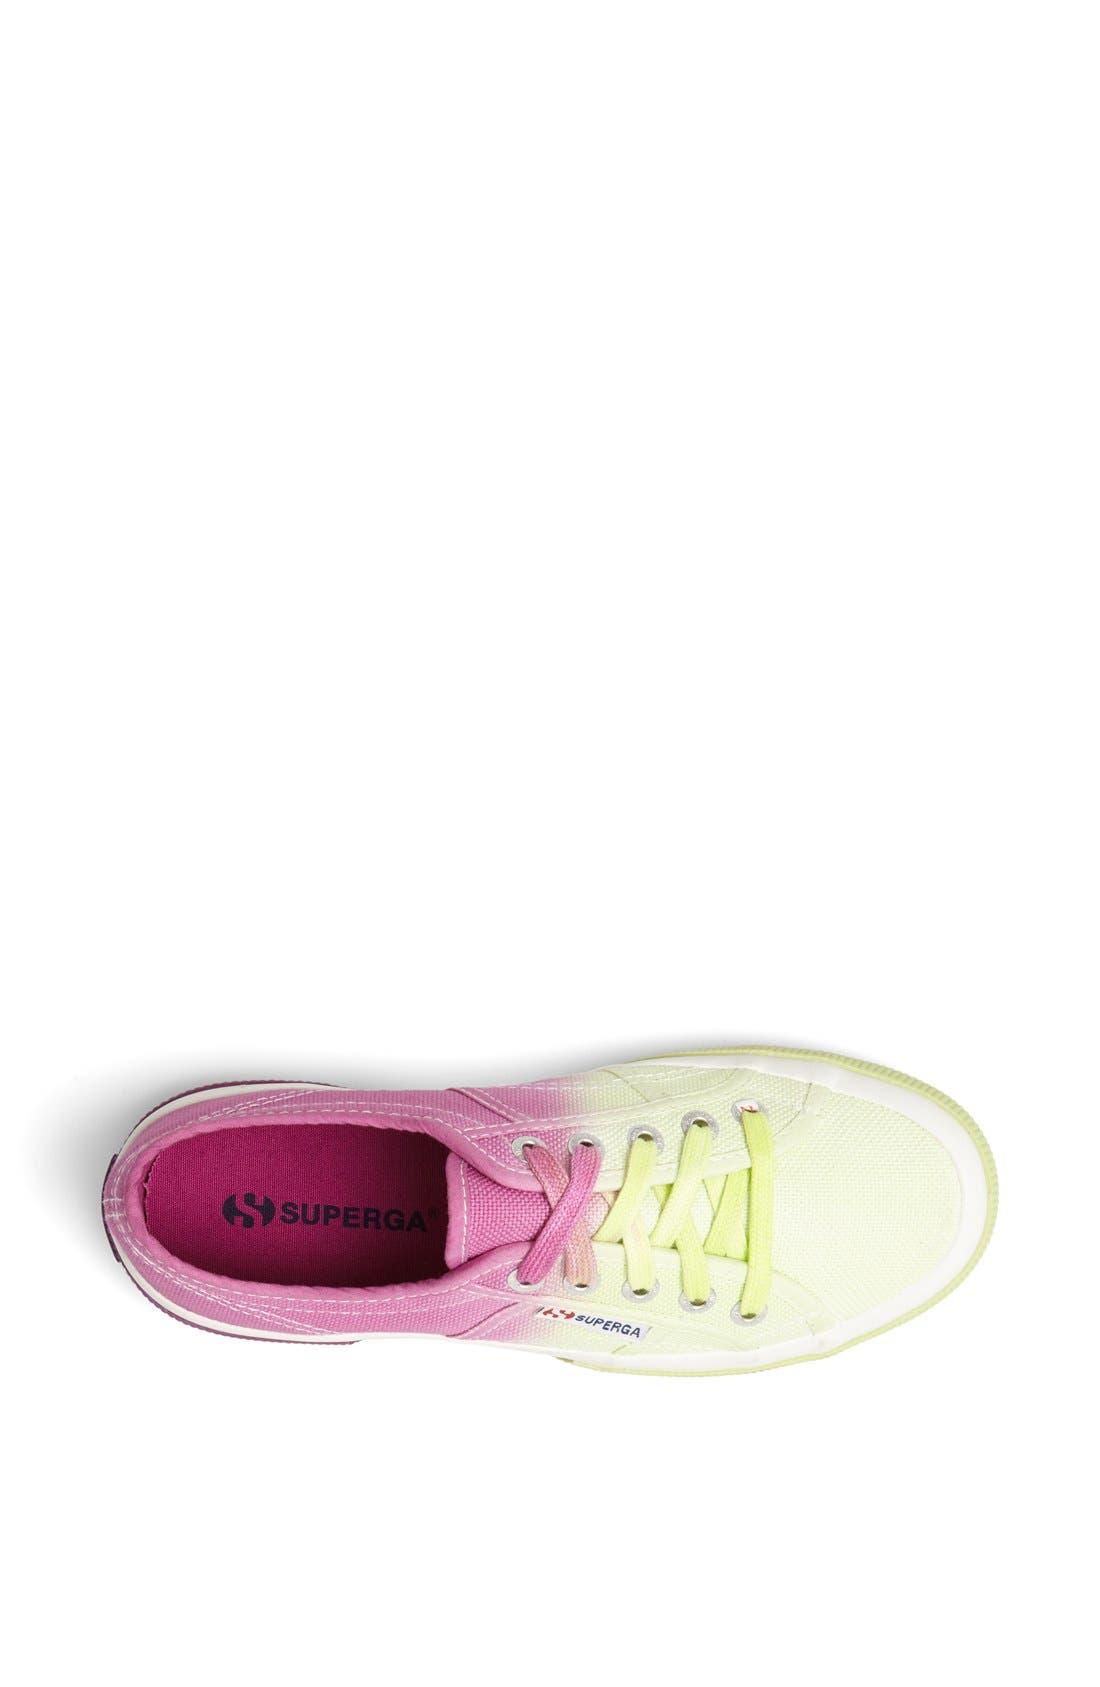 Alternate Image 3  - Superga 'Cotu - Shade' Sneaker (Women)